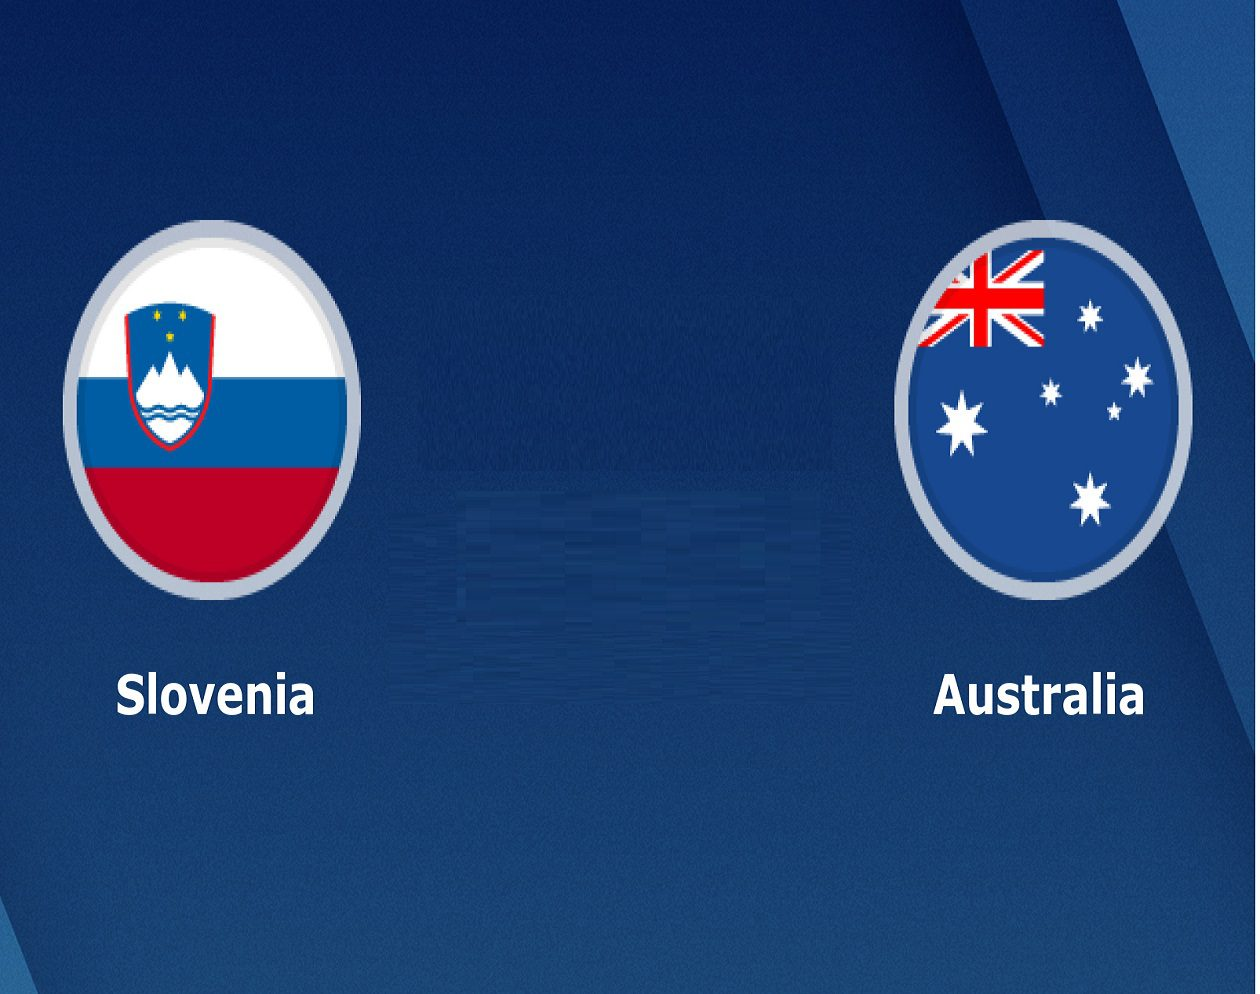 2021 Tokyo Olympics: Australia vs Slovenia Odds and Predictions: Slovenia to Win